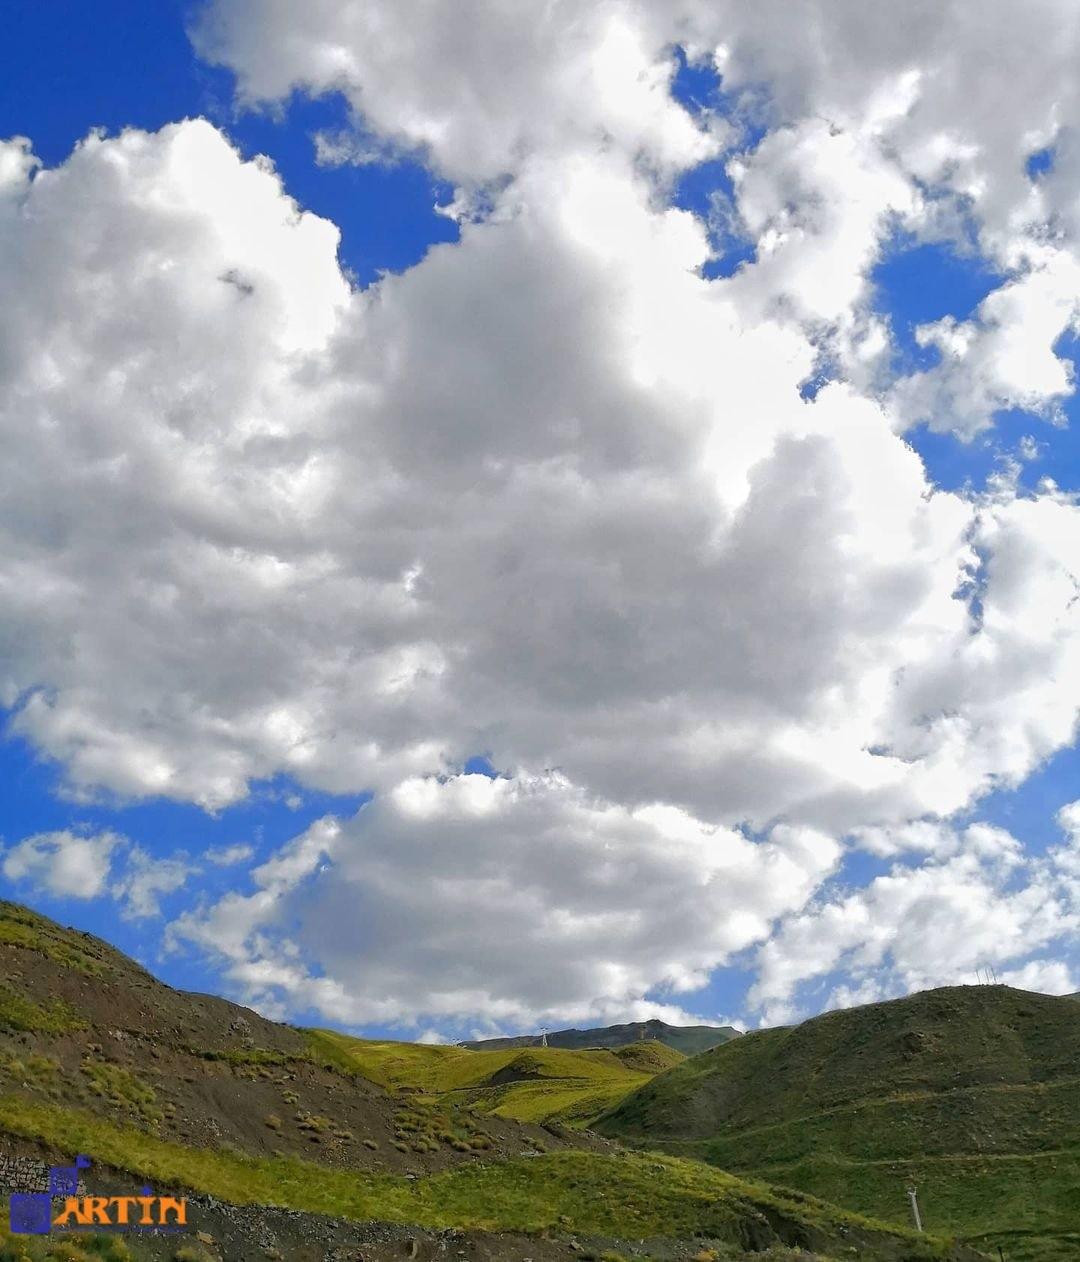 Alburz mountain ranges in Iran travelartin.com